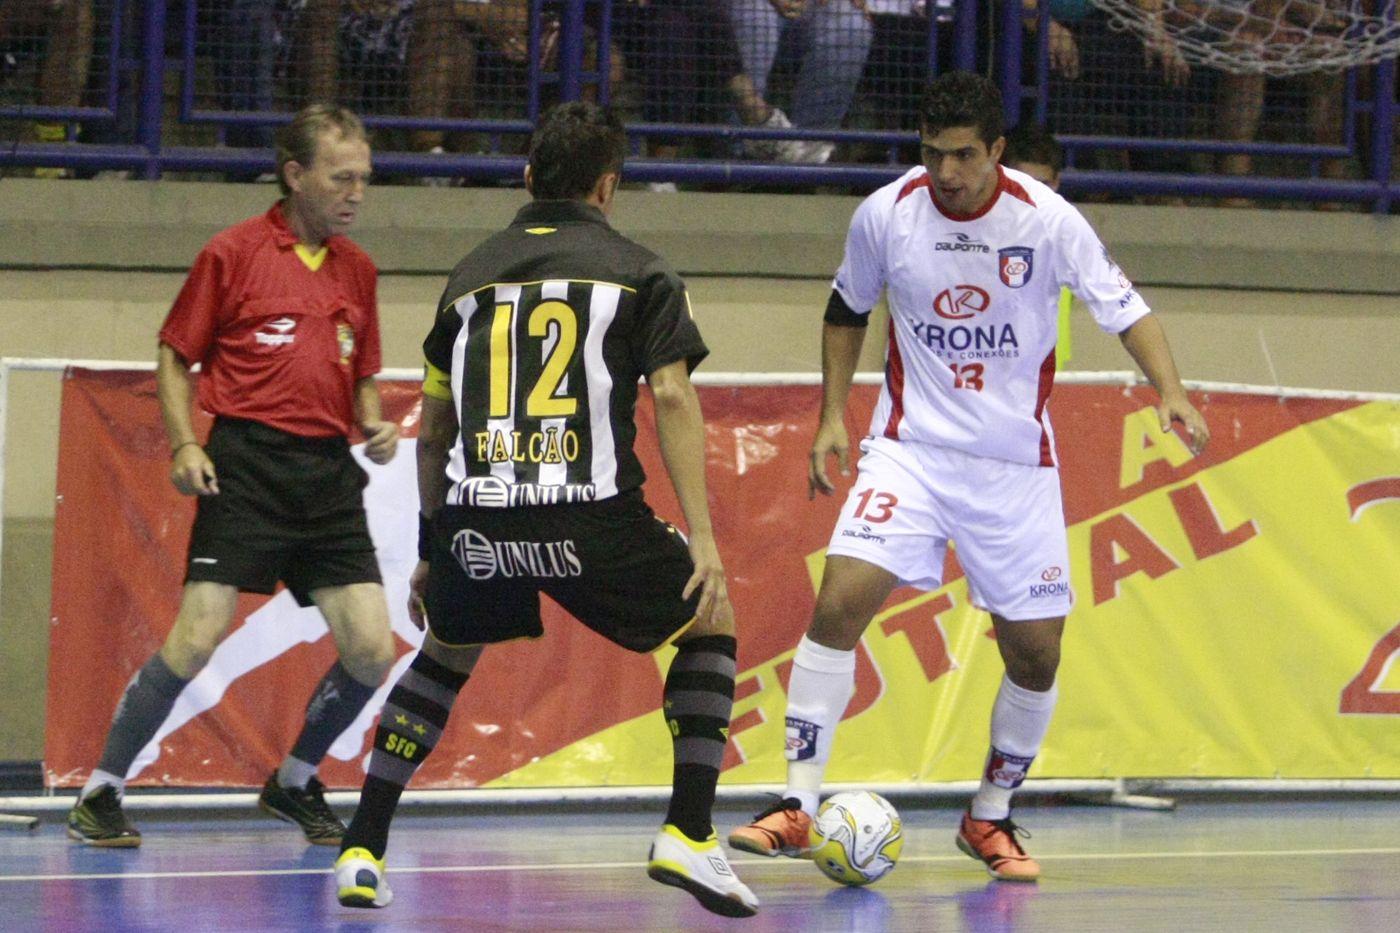 liga futbol sala brasil: